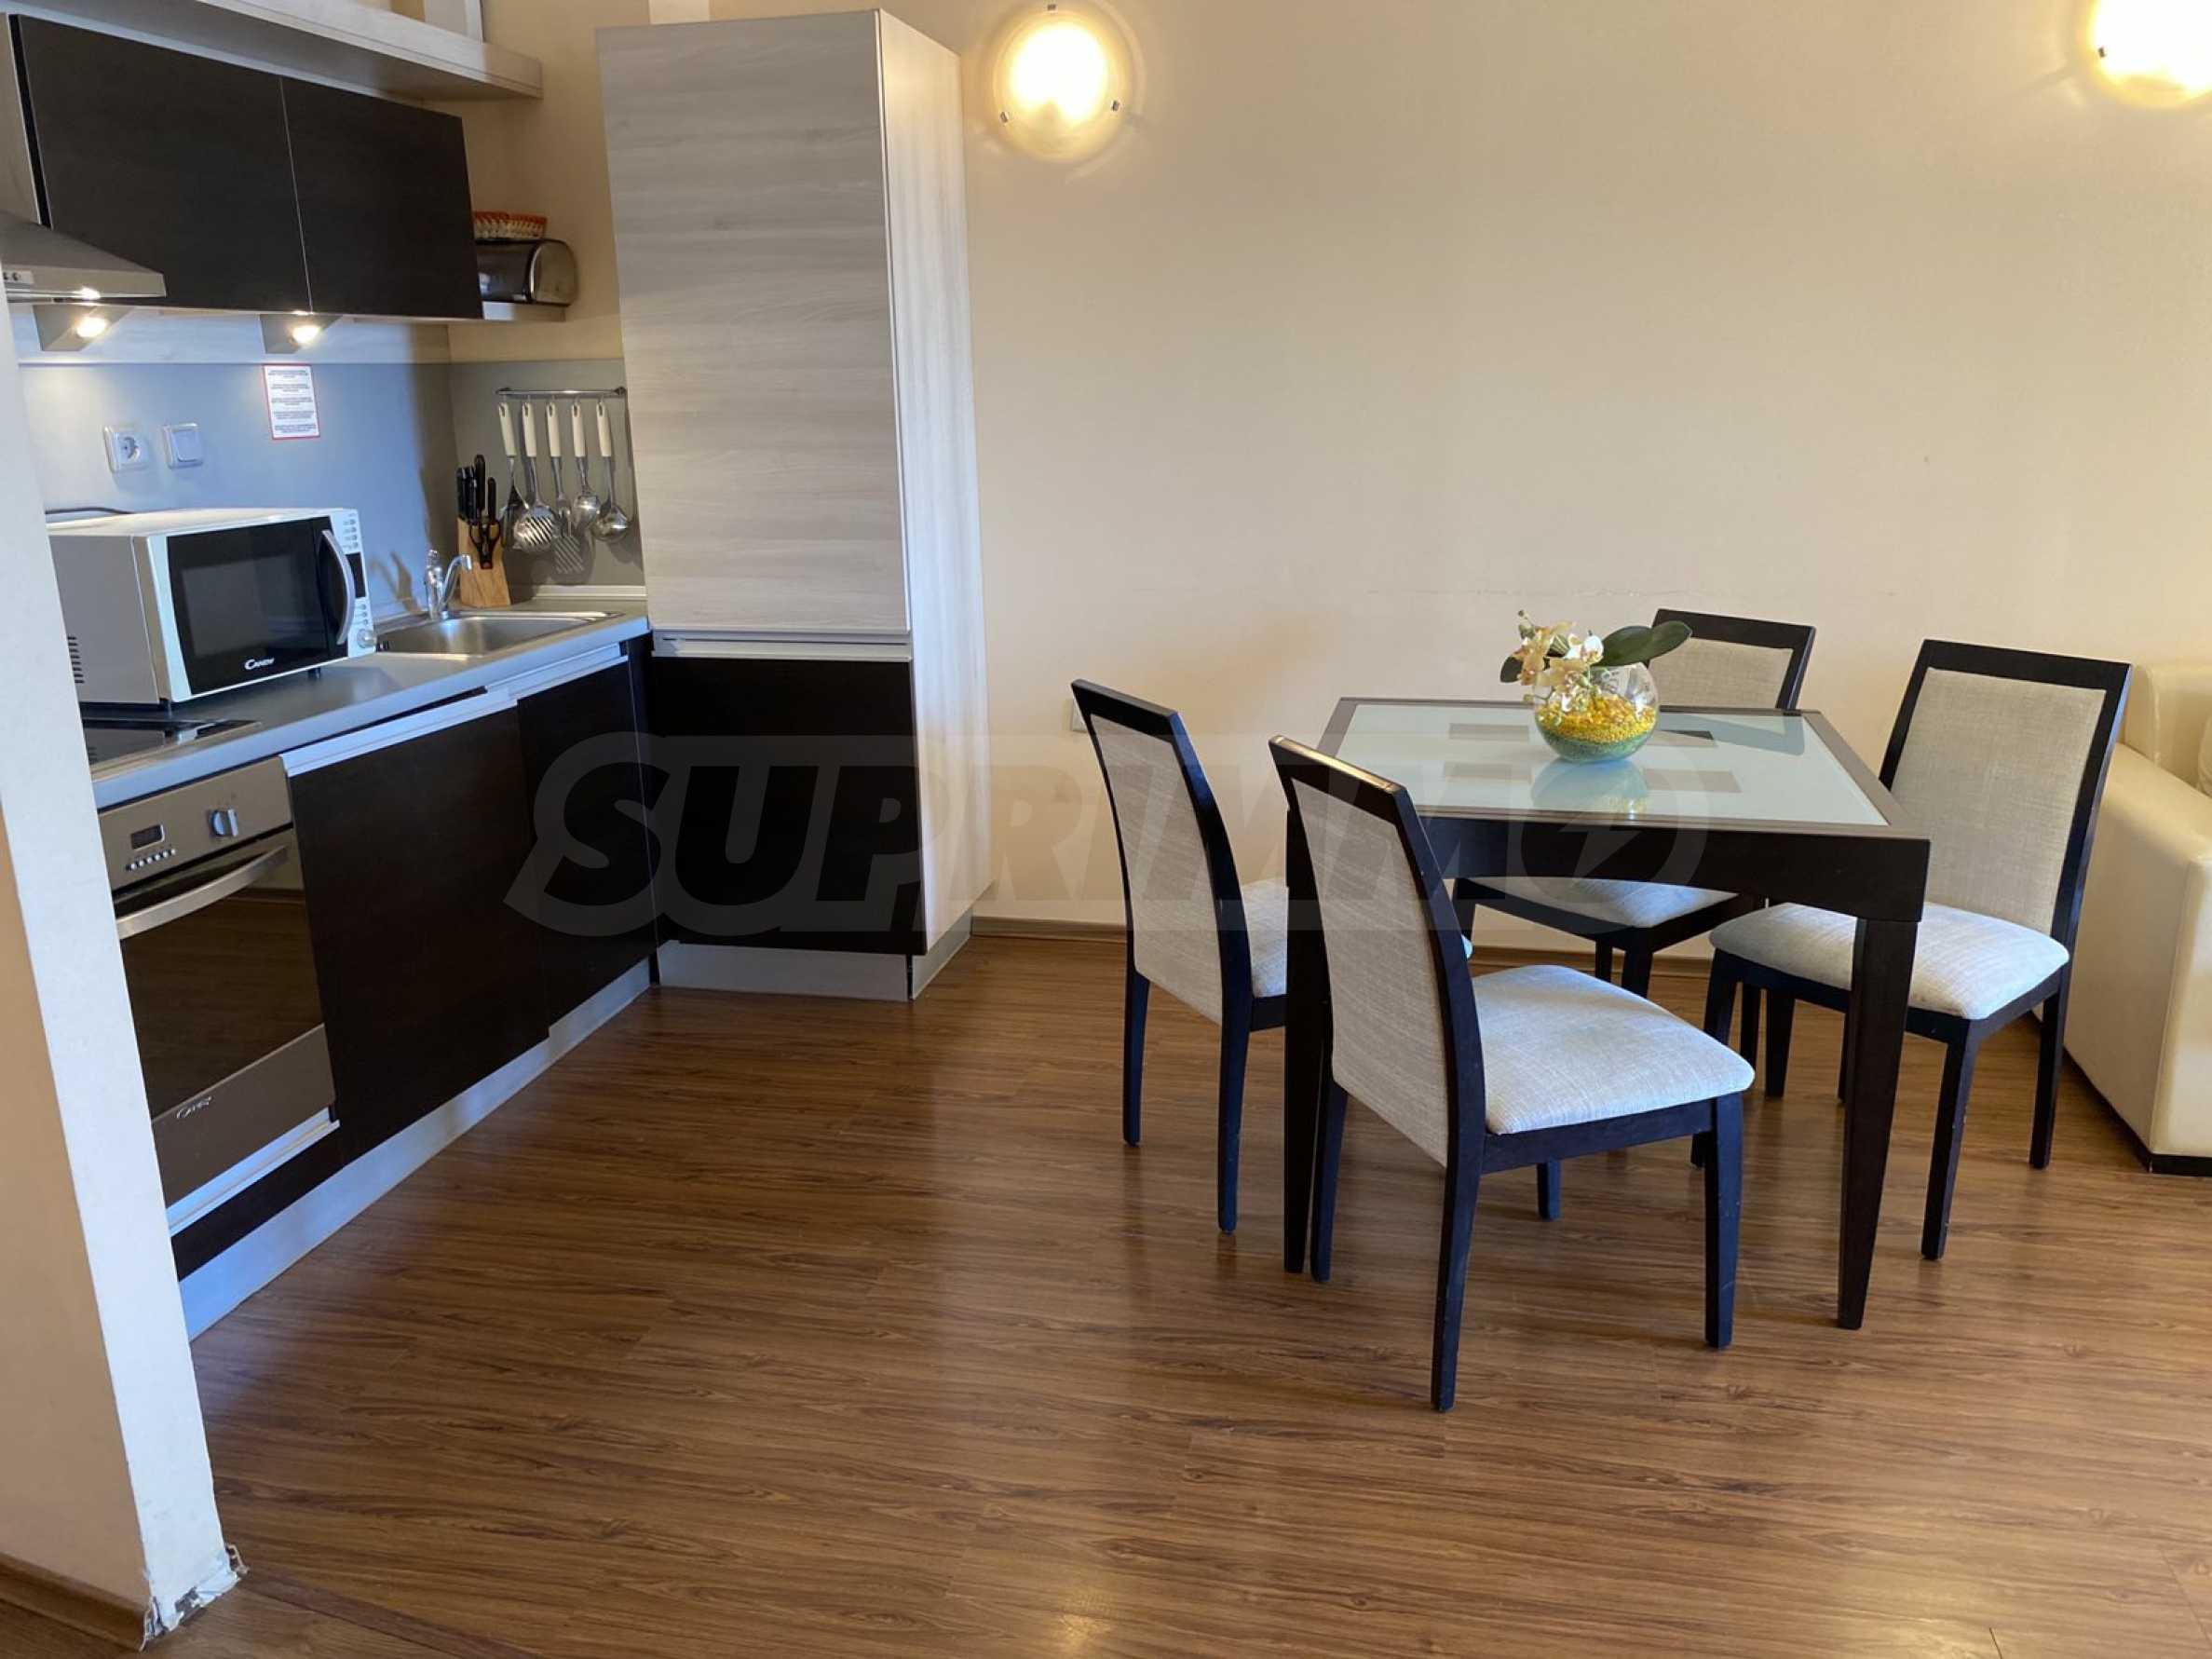 1-bedroom apartment Duralek  3